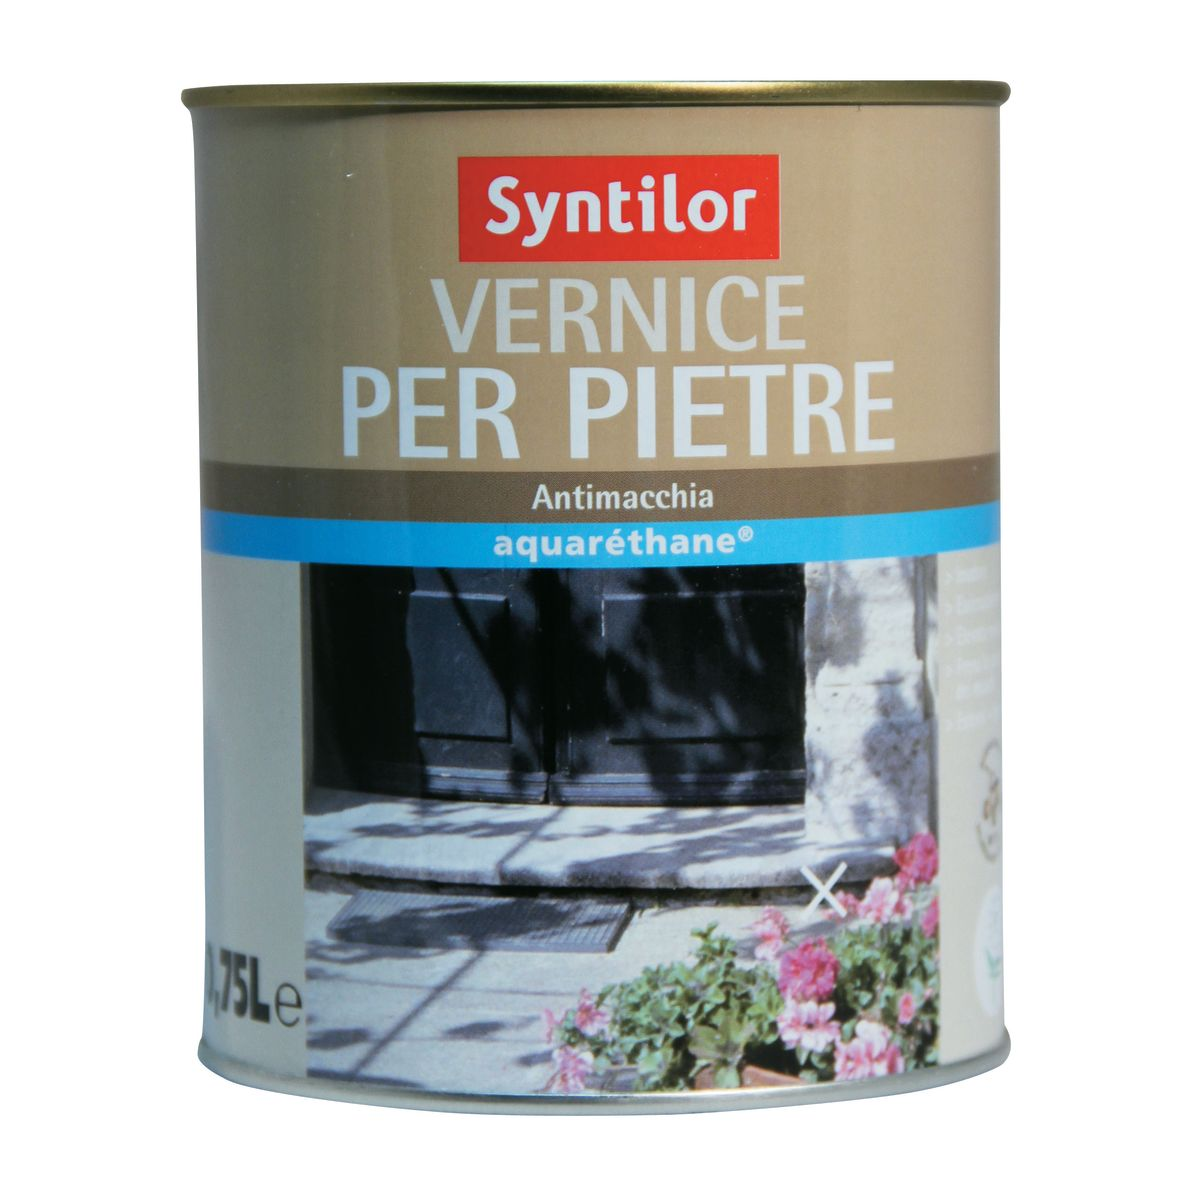 Vernice per pietre syntilor trasparente opaco 0 75 l for Stendibiancheria leroy merlin